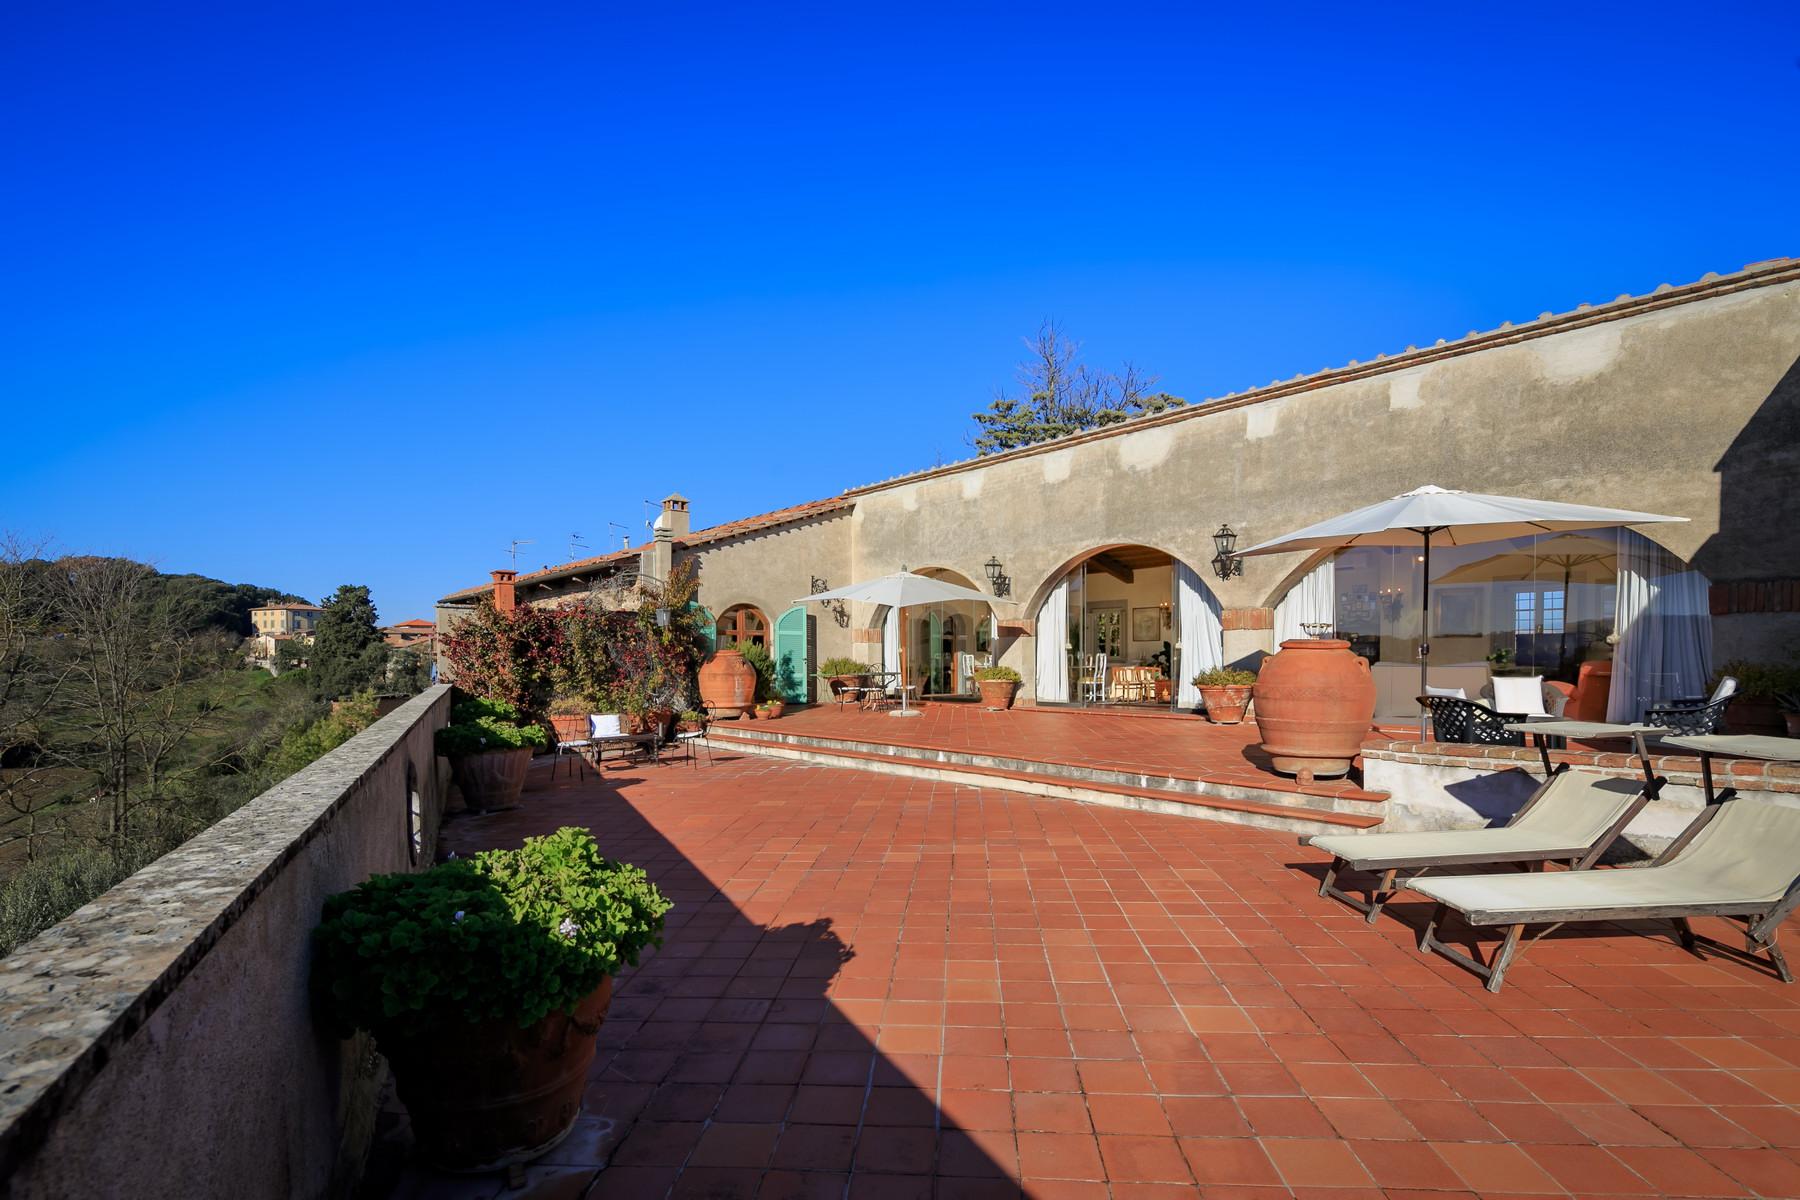 Villa in Vendita a Casciana Terme Lari: 5 locali, 550 mq - Foto 8